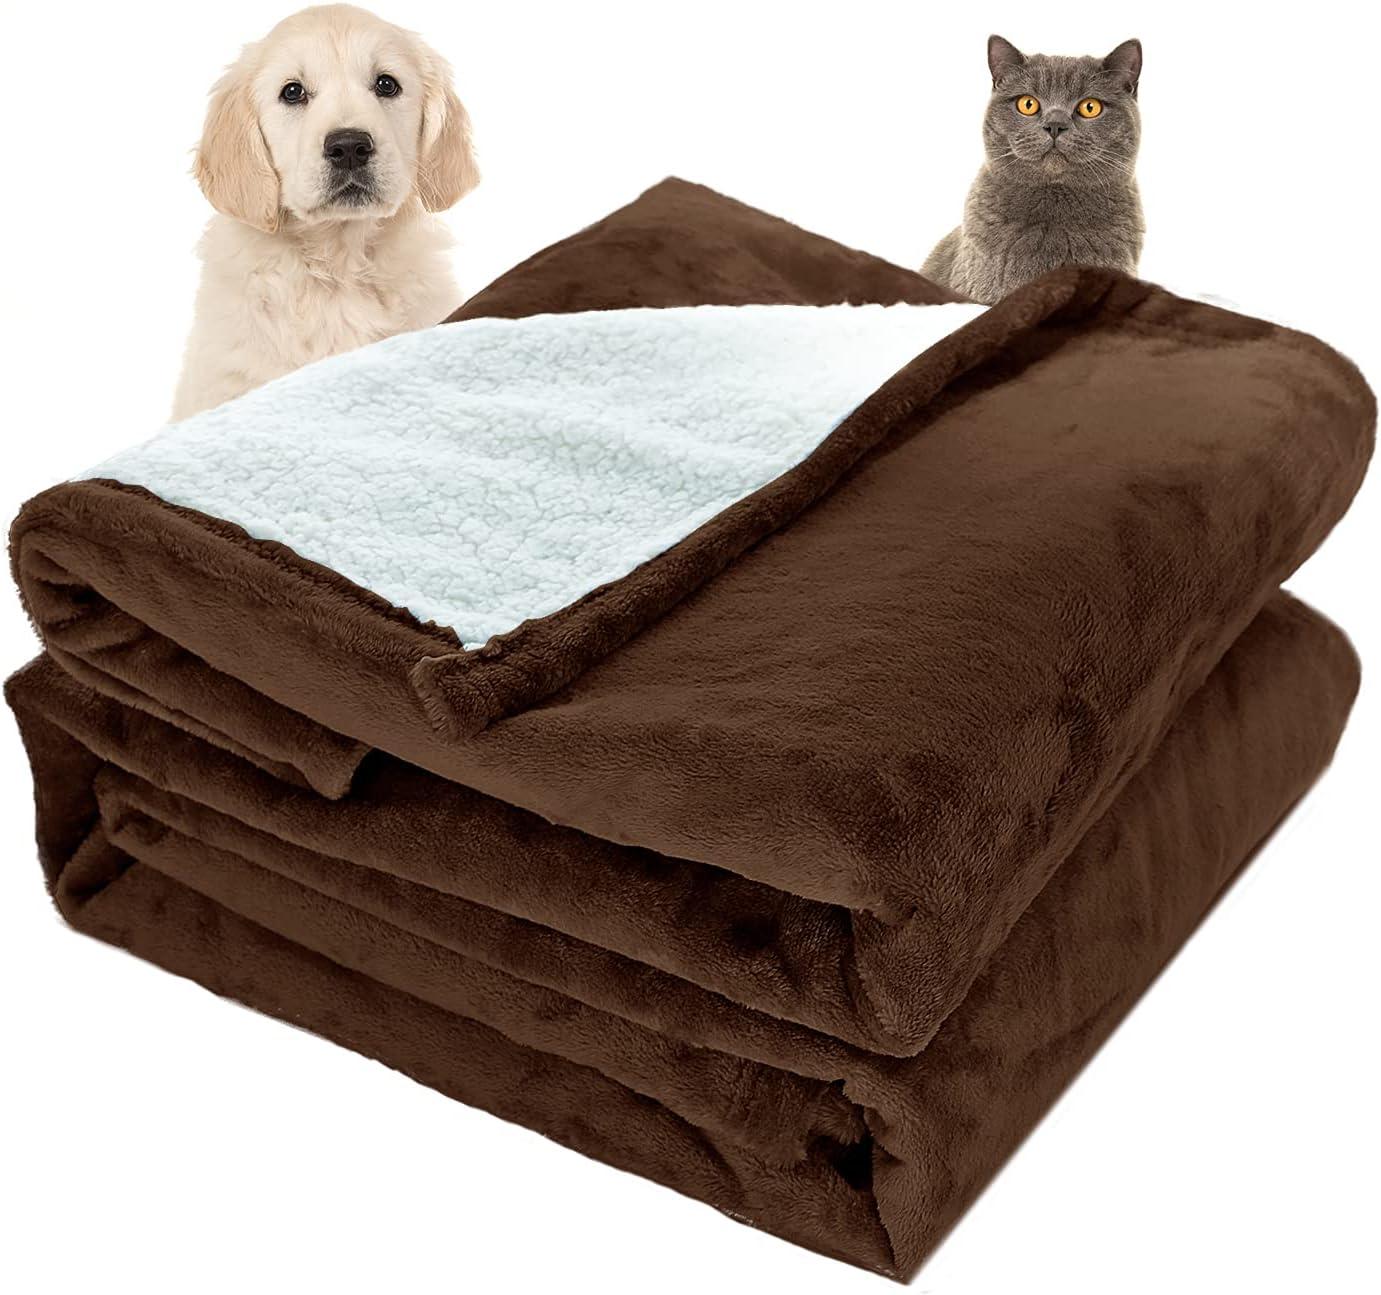 PIOZF Waterproof Dog Blanket trust Reversible Deluxe Warm Fleece Soft Bl Pet